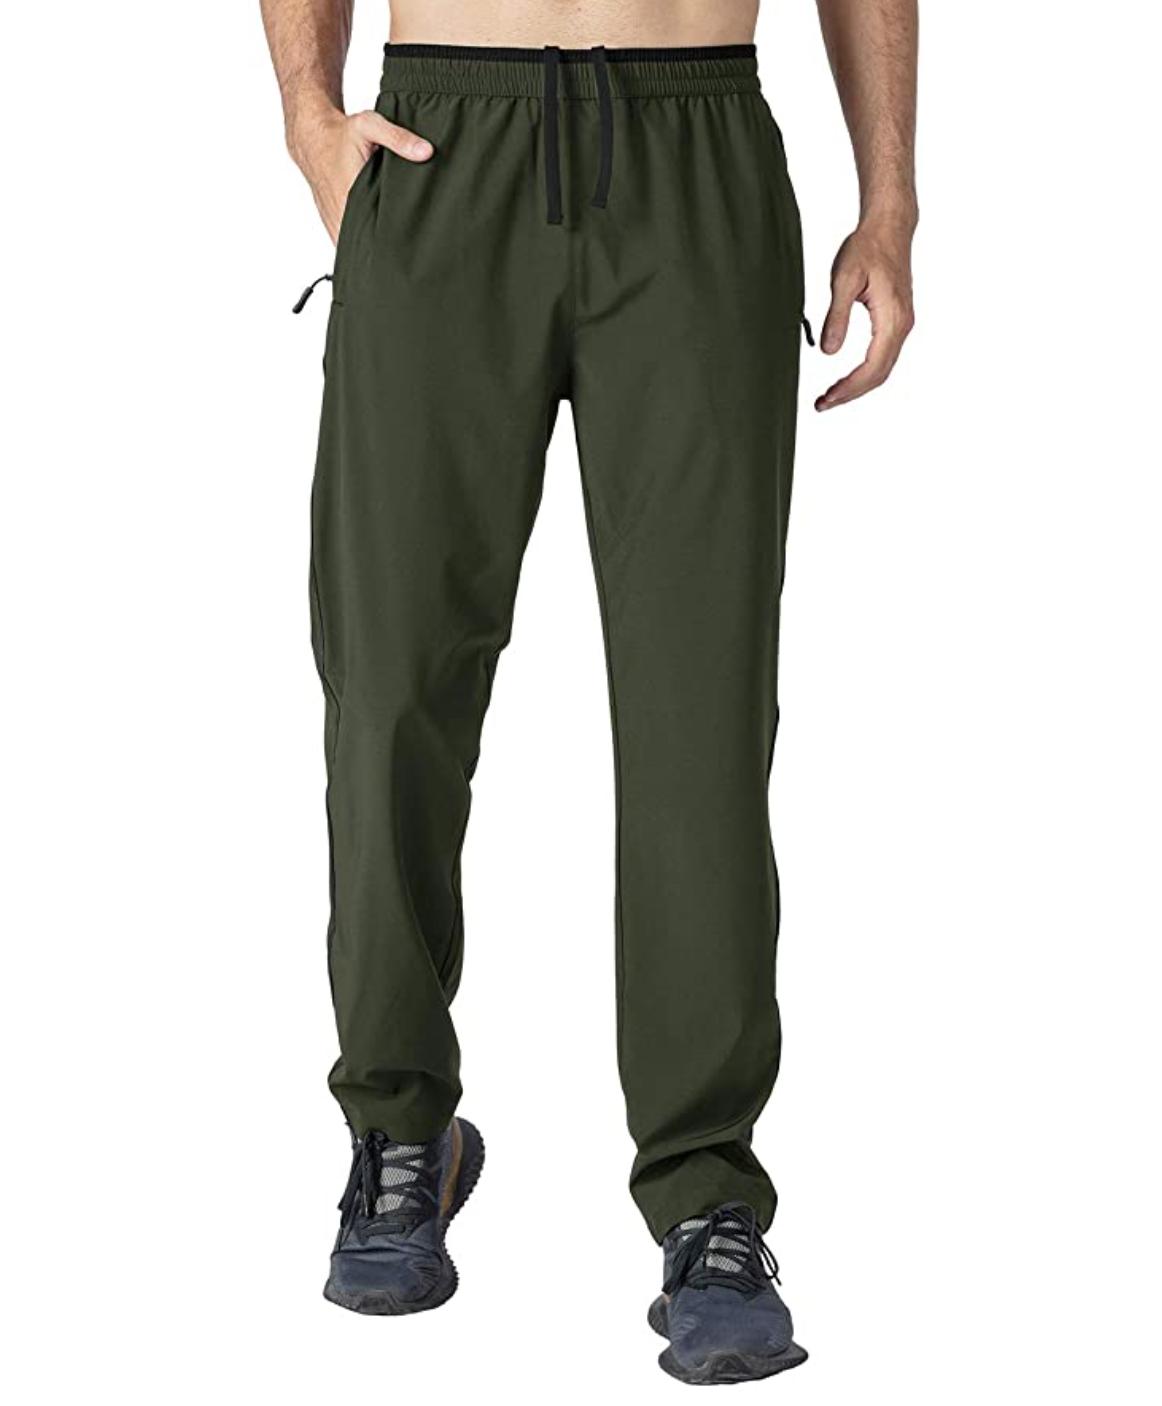 TBMPOY hiking pants